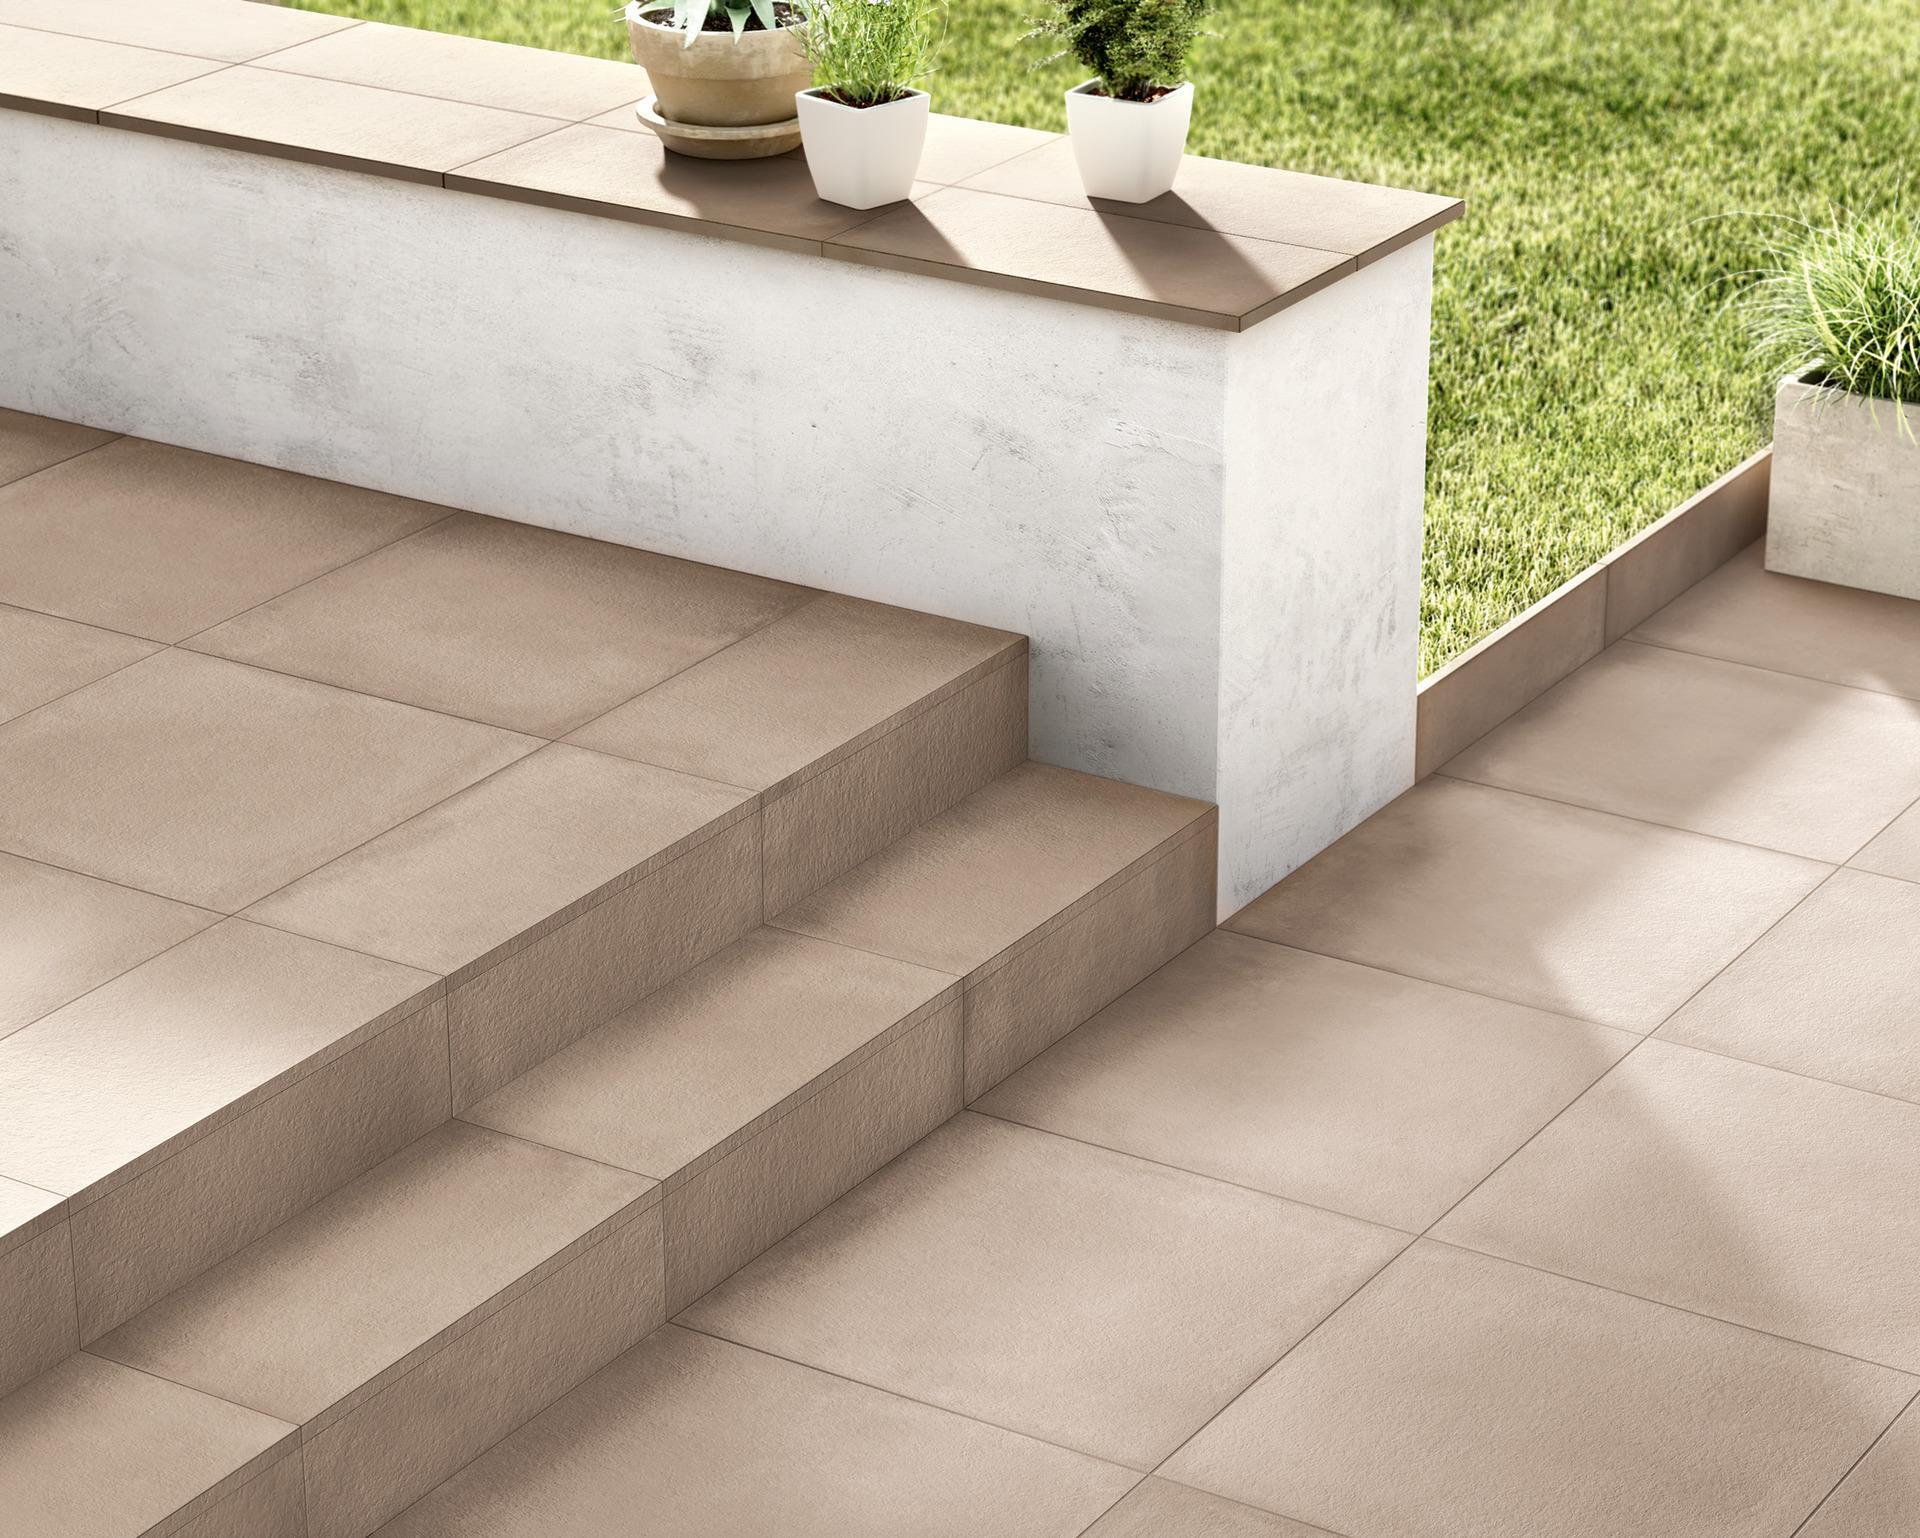 rewind xt20 collection terracotta concrete effect. Black Bedroom Furniture Sets. Home Design Ideas